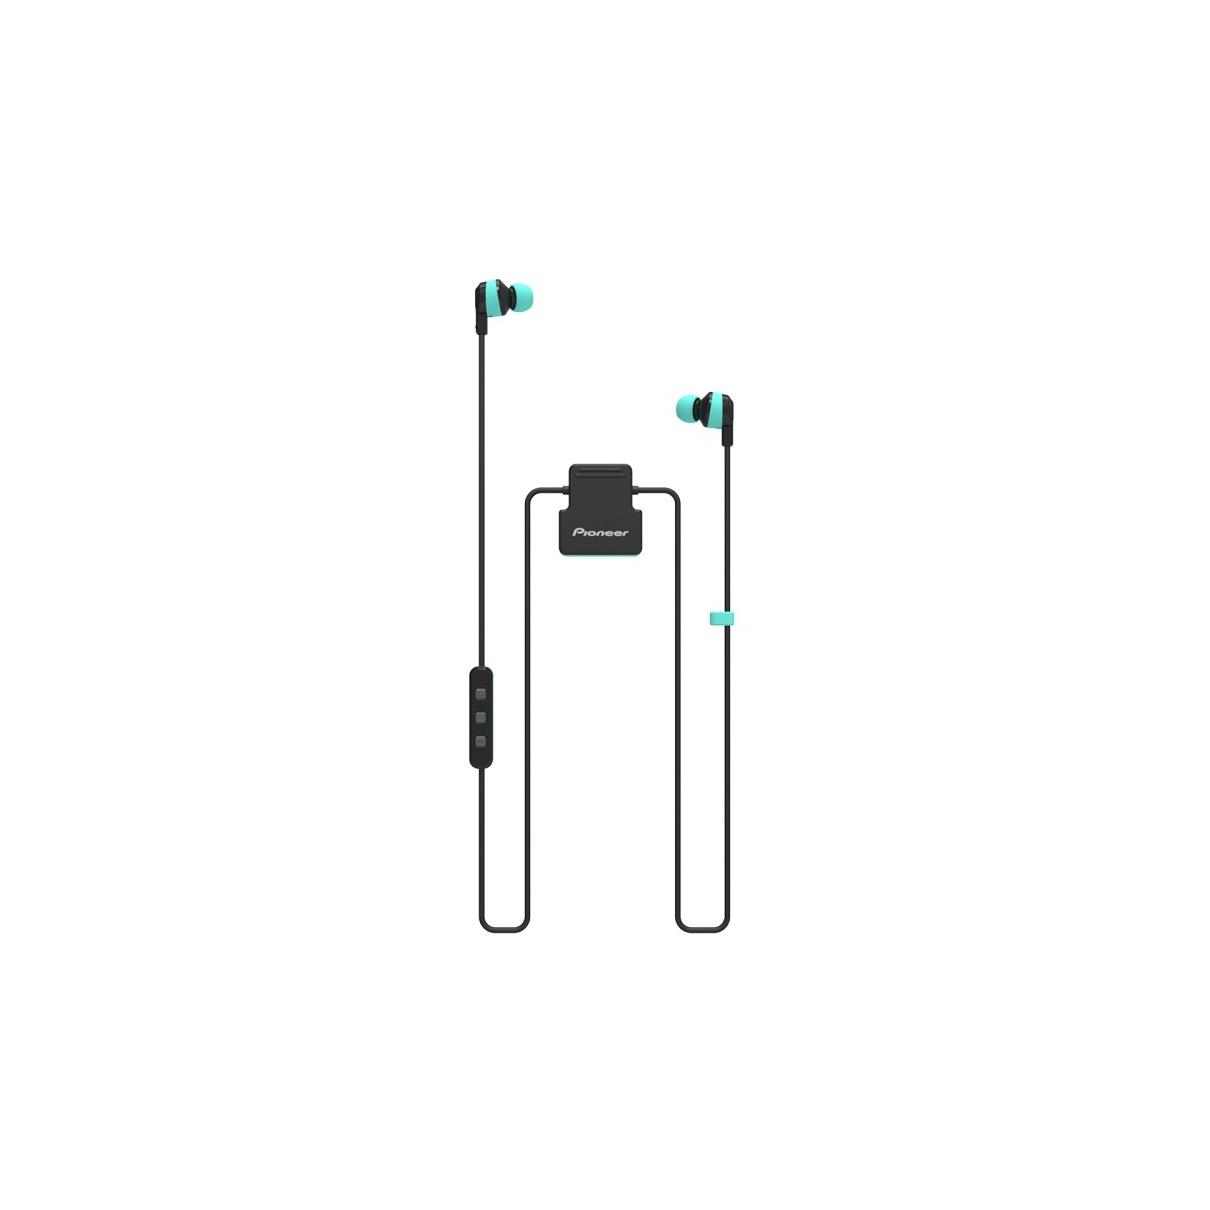 Pioneer in-ear oordopjes SE-CL5BT-GR groen